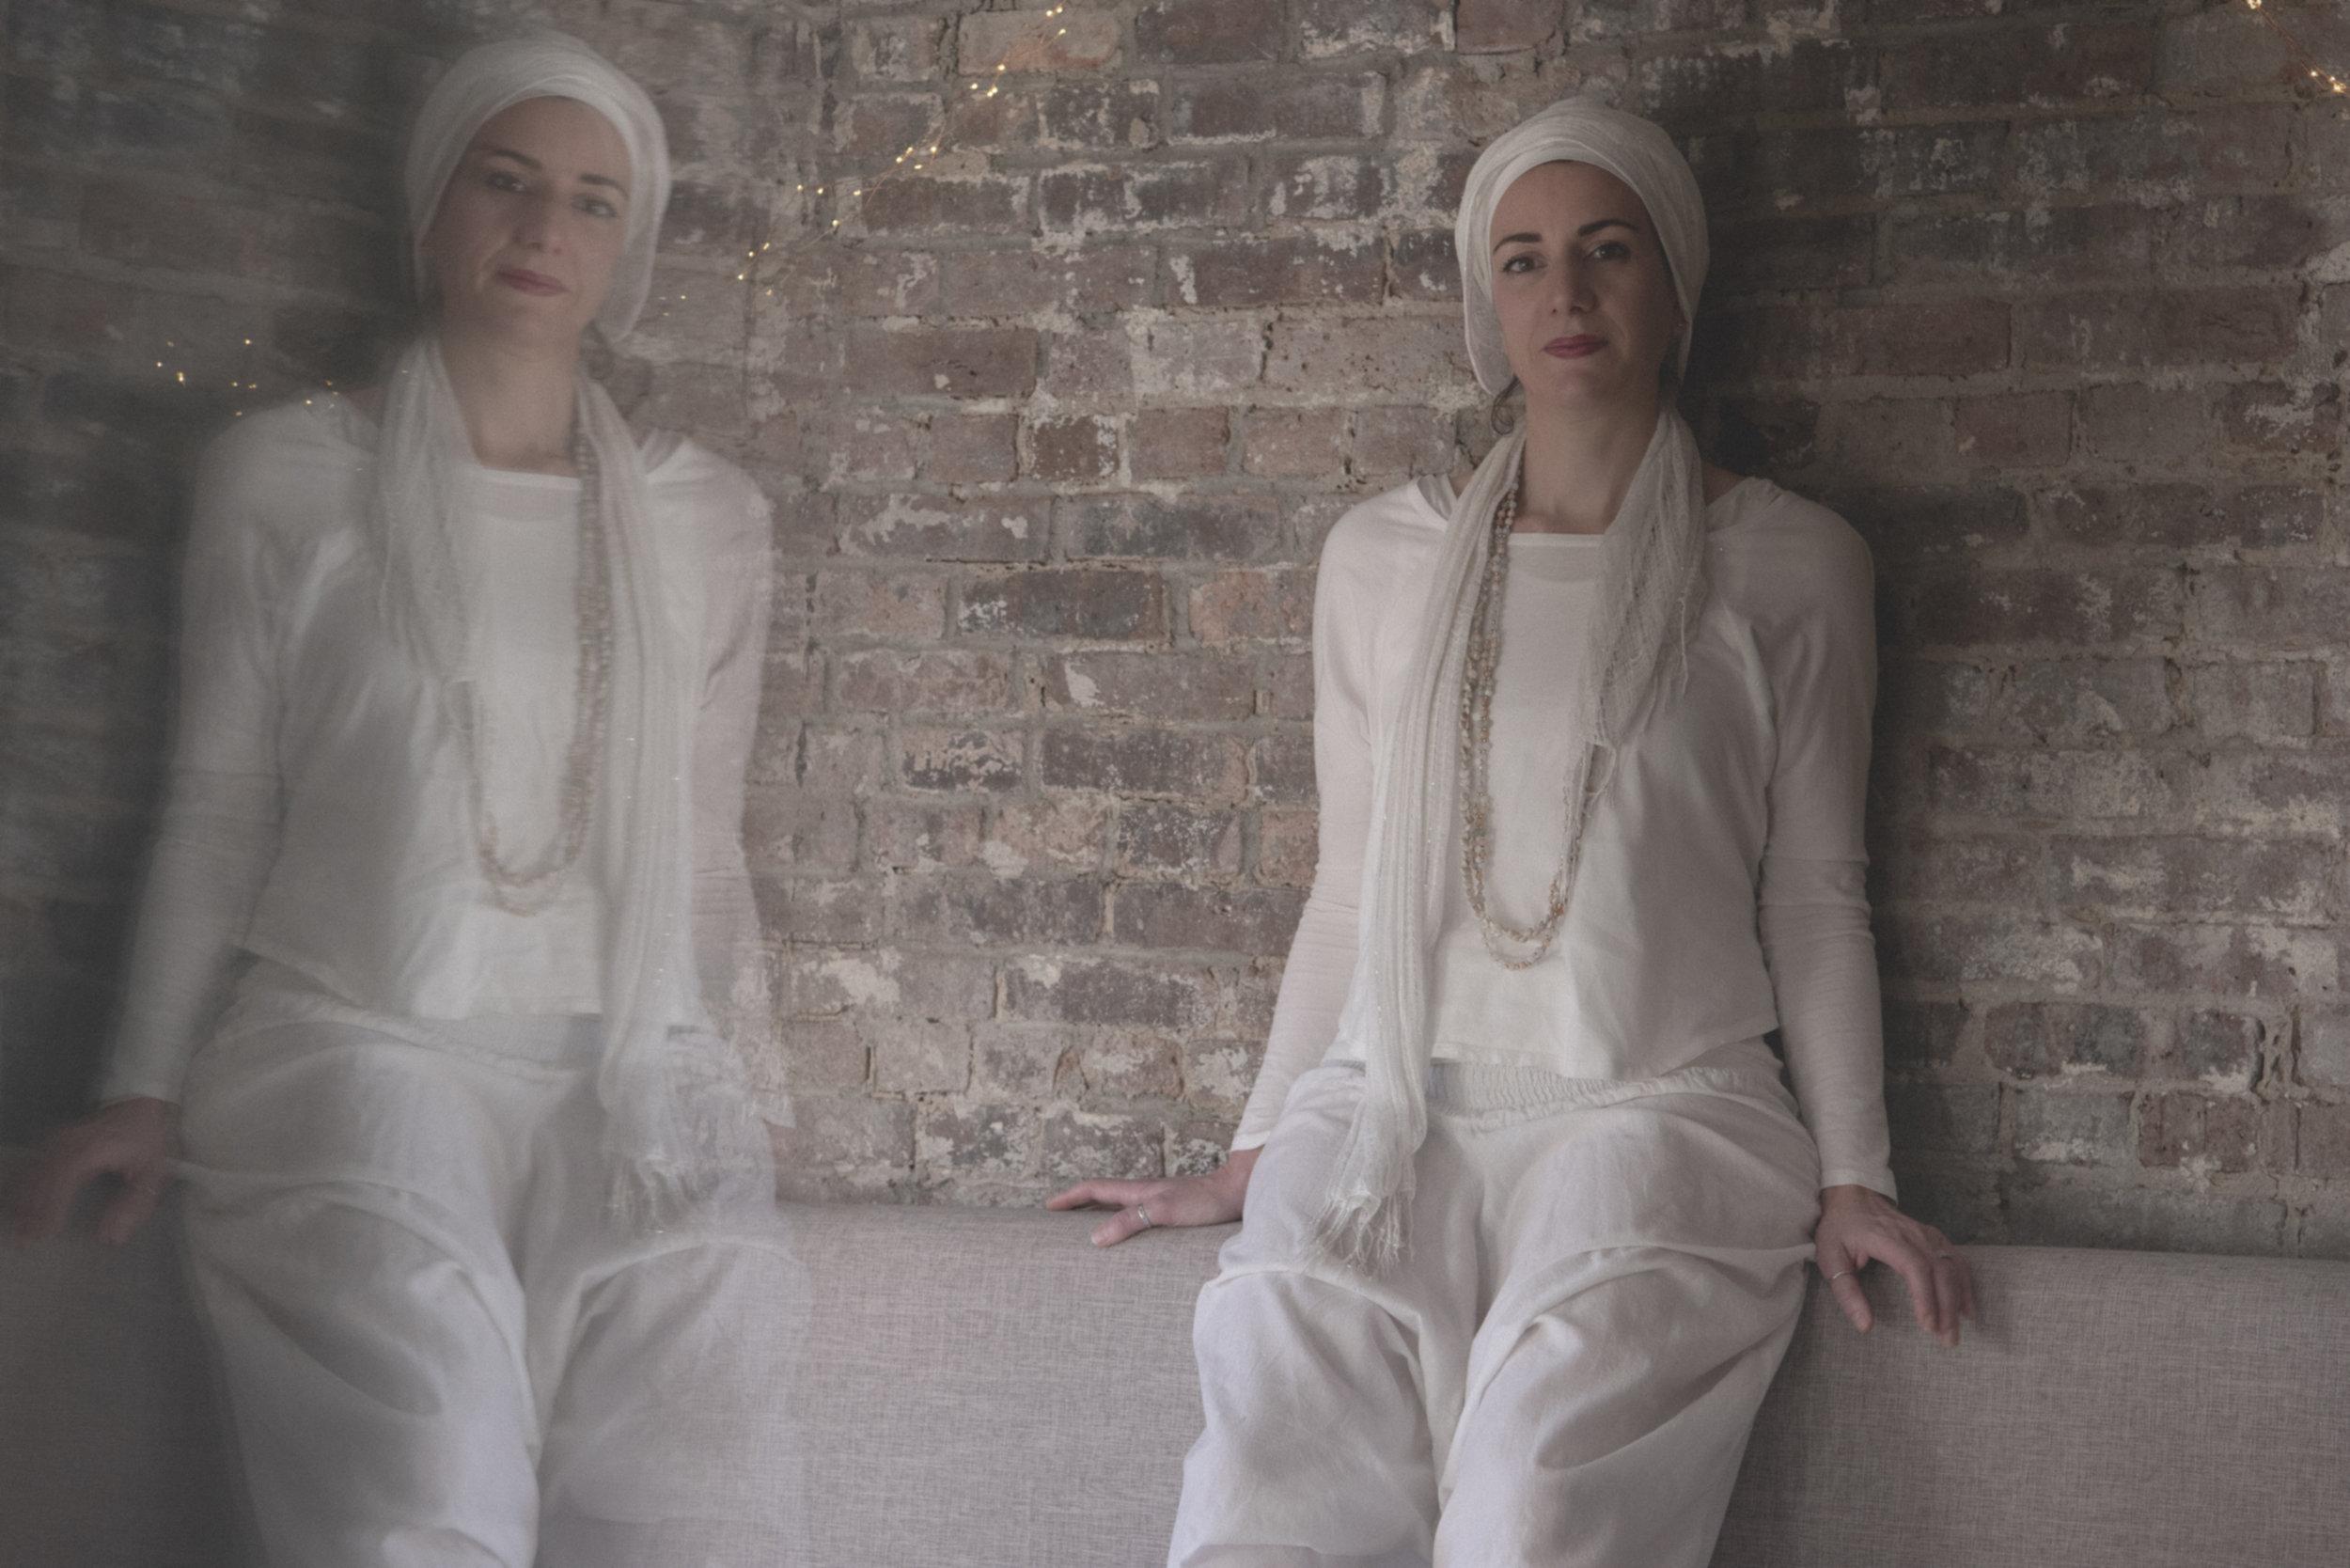 © Florence-Montmare-Photographer-Aurelie-Desmas-Kundalini-Yoga-Yogi-New-York-2018-Double-Portrait-Highres.jpg